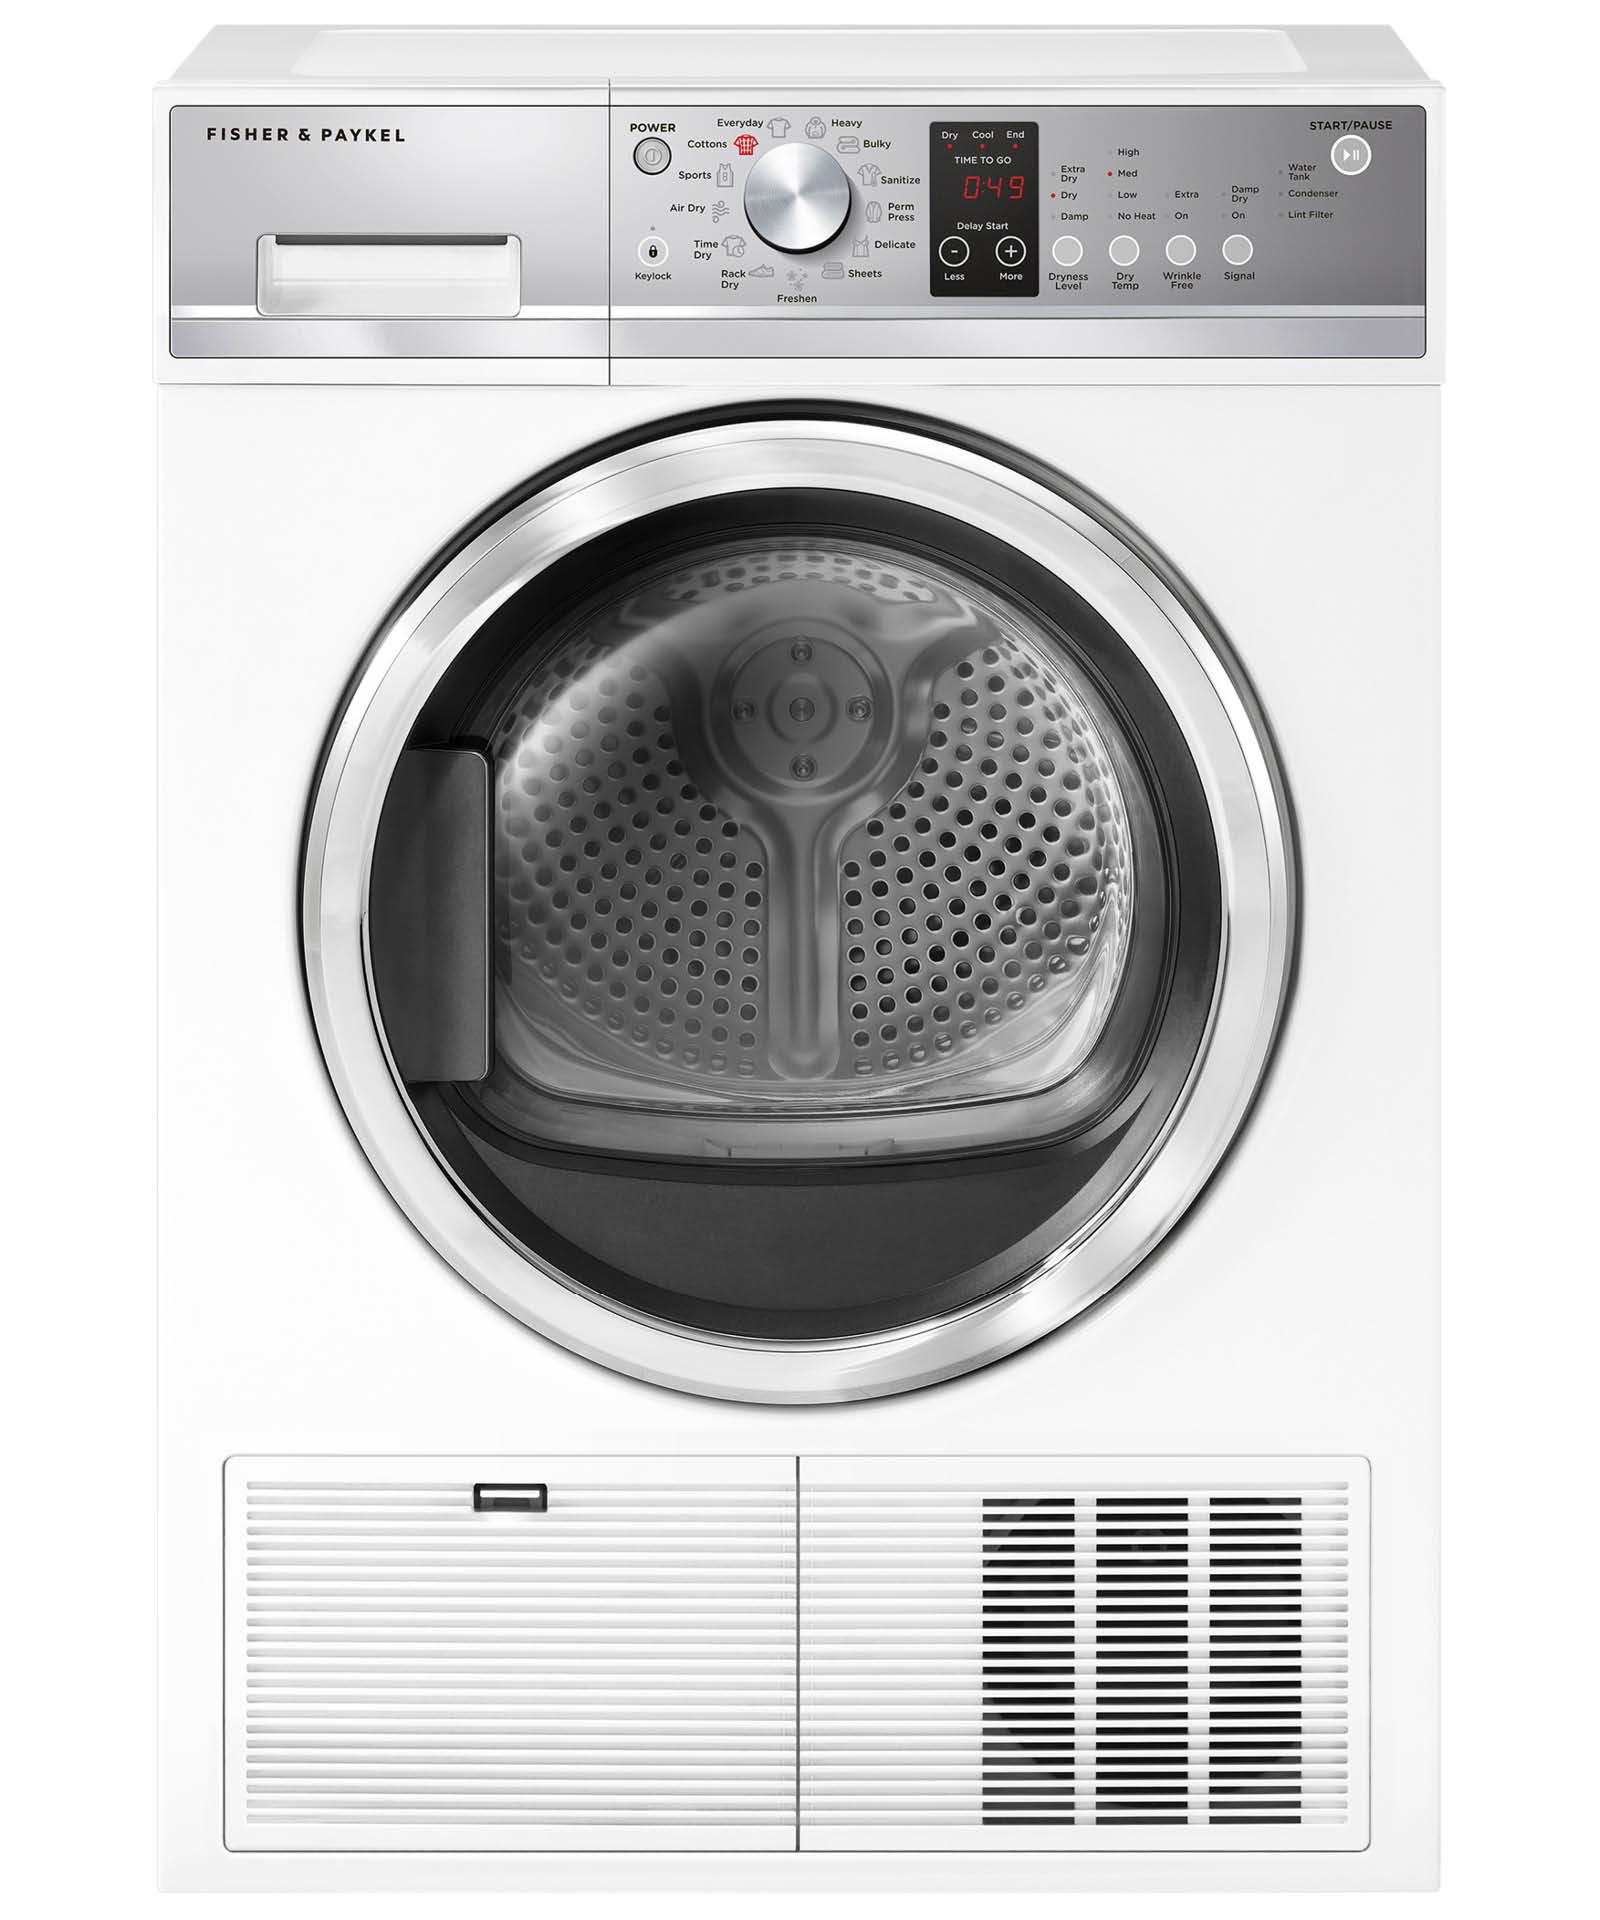 Model: DE4024P1 | Fisher and Paykel Condensing dryer, 4.0 cu ft, Autosensing